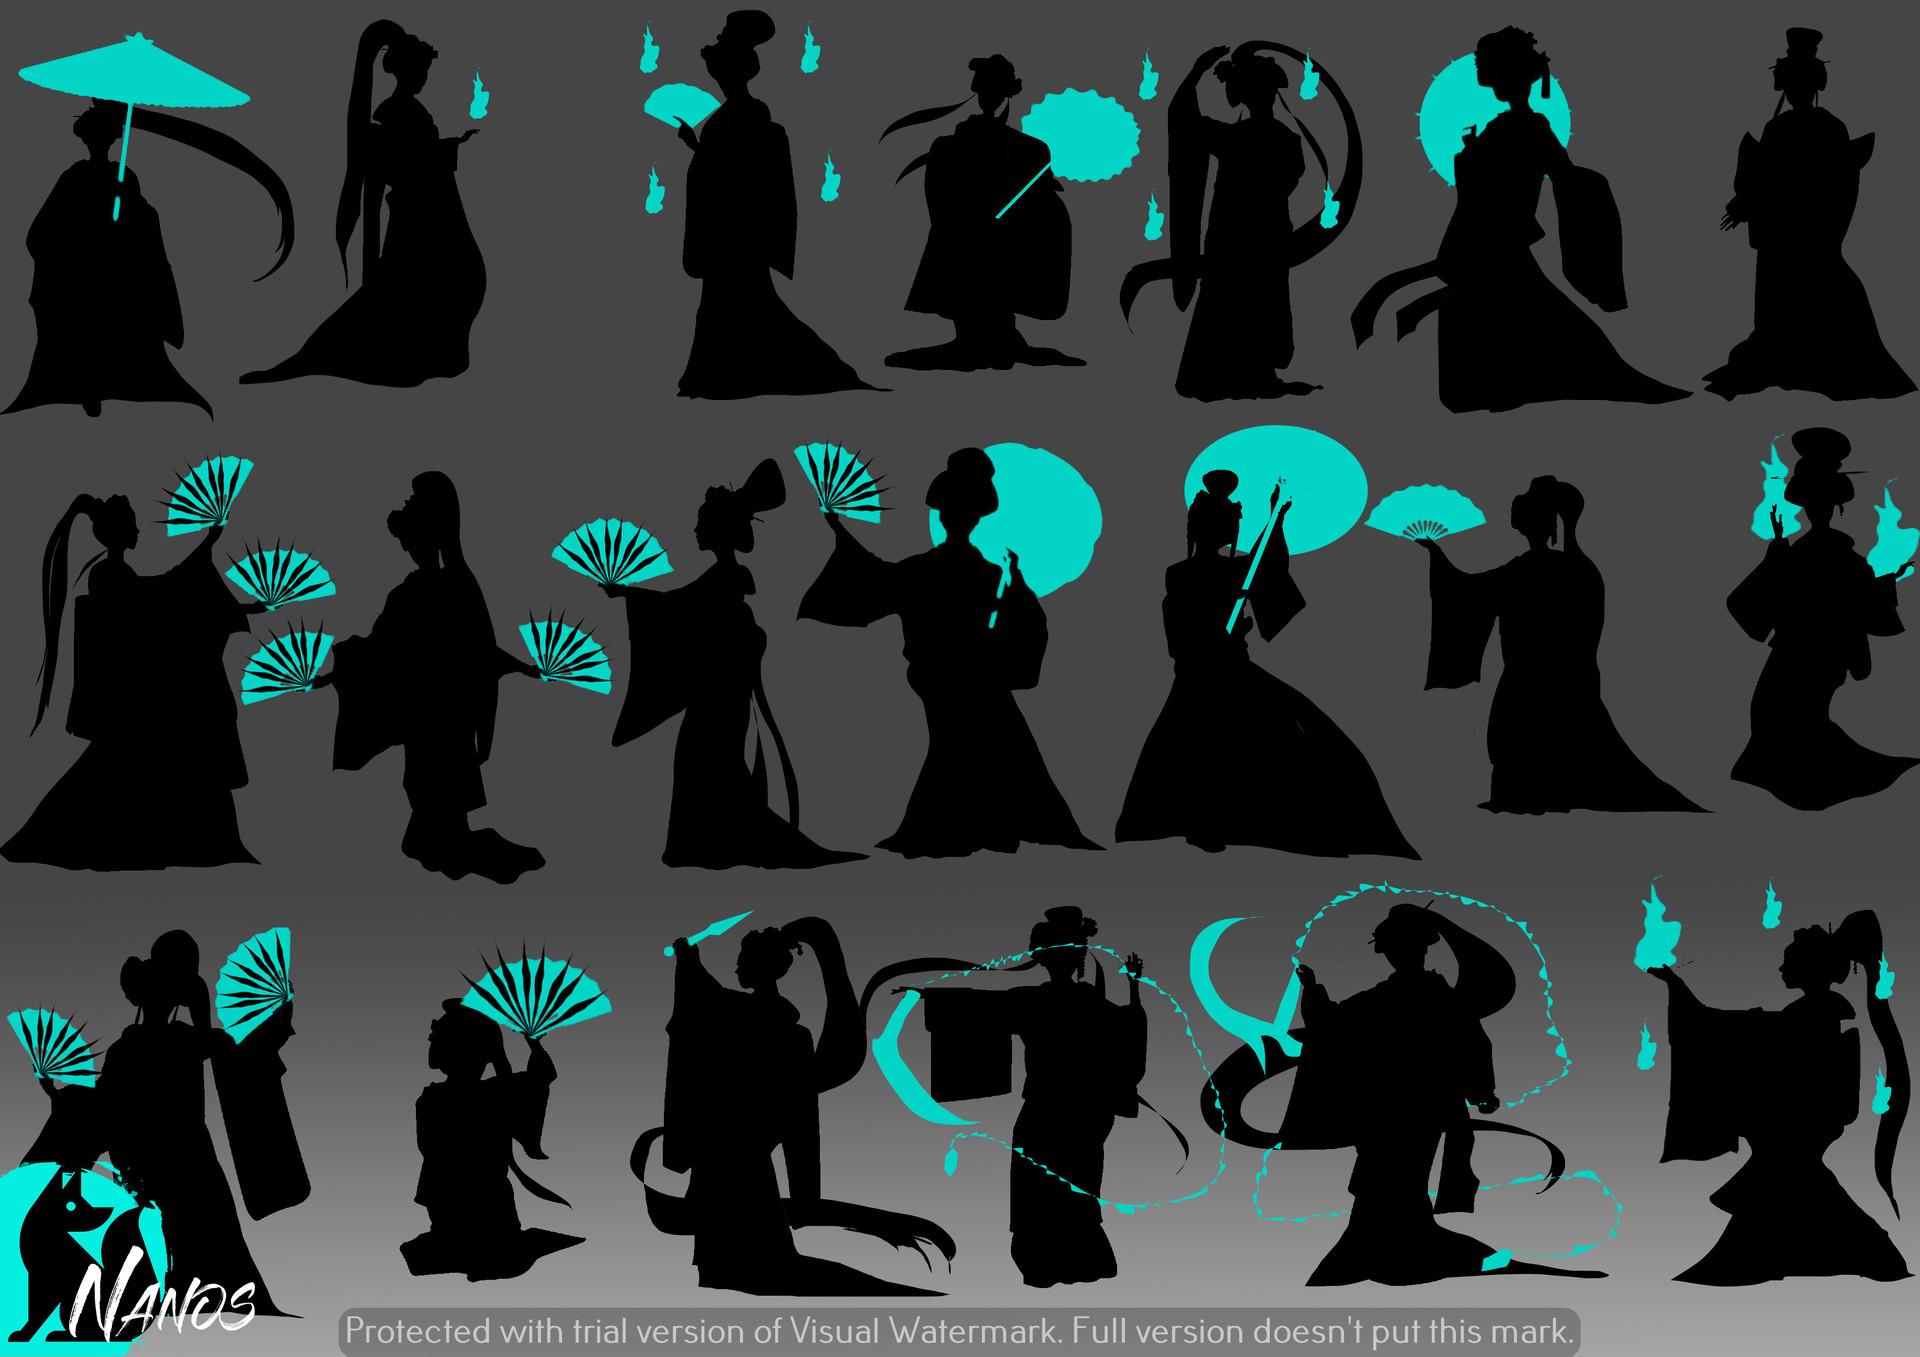 ArtStation - Lady Seinharu Kitsune Silhouette - Enigma